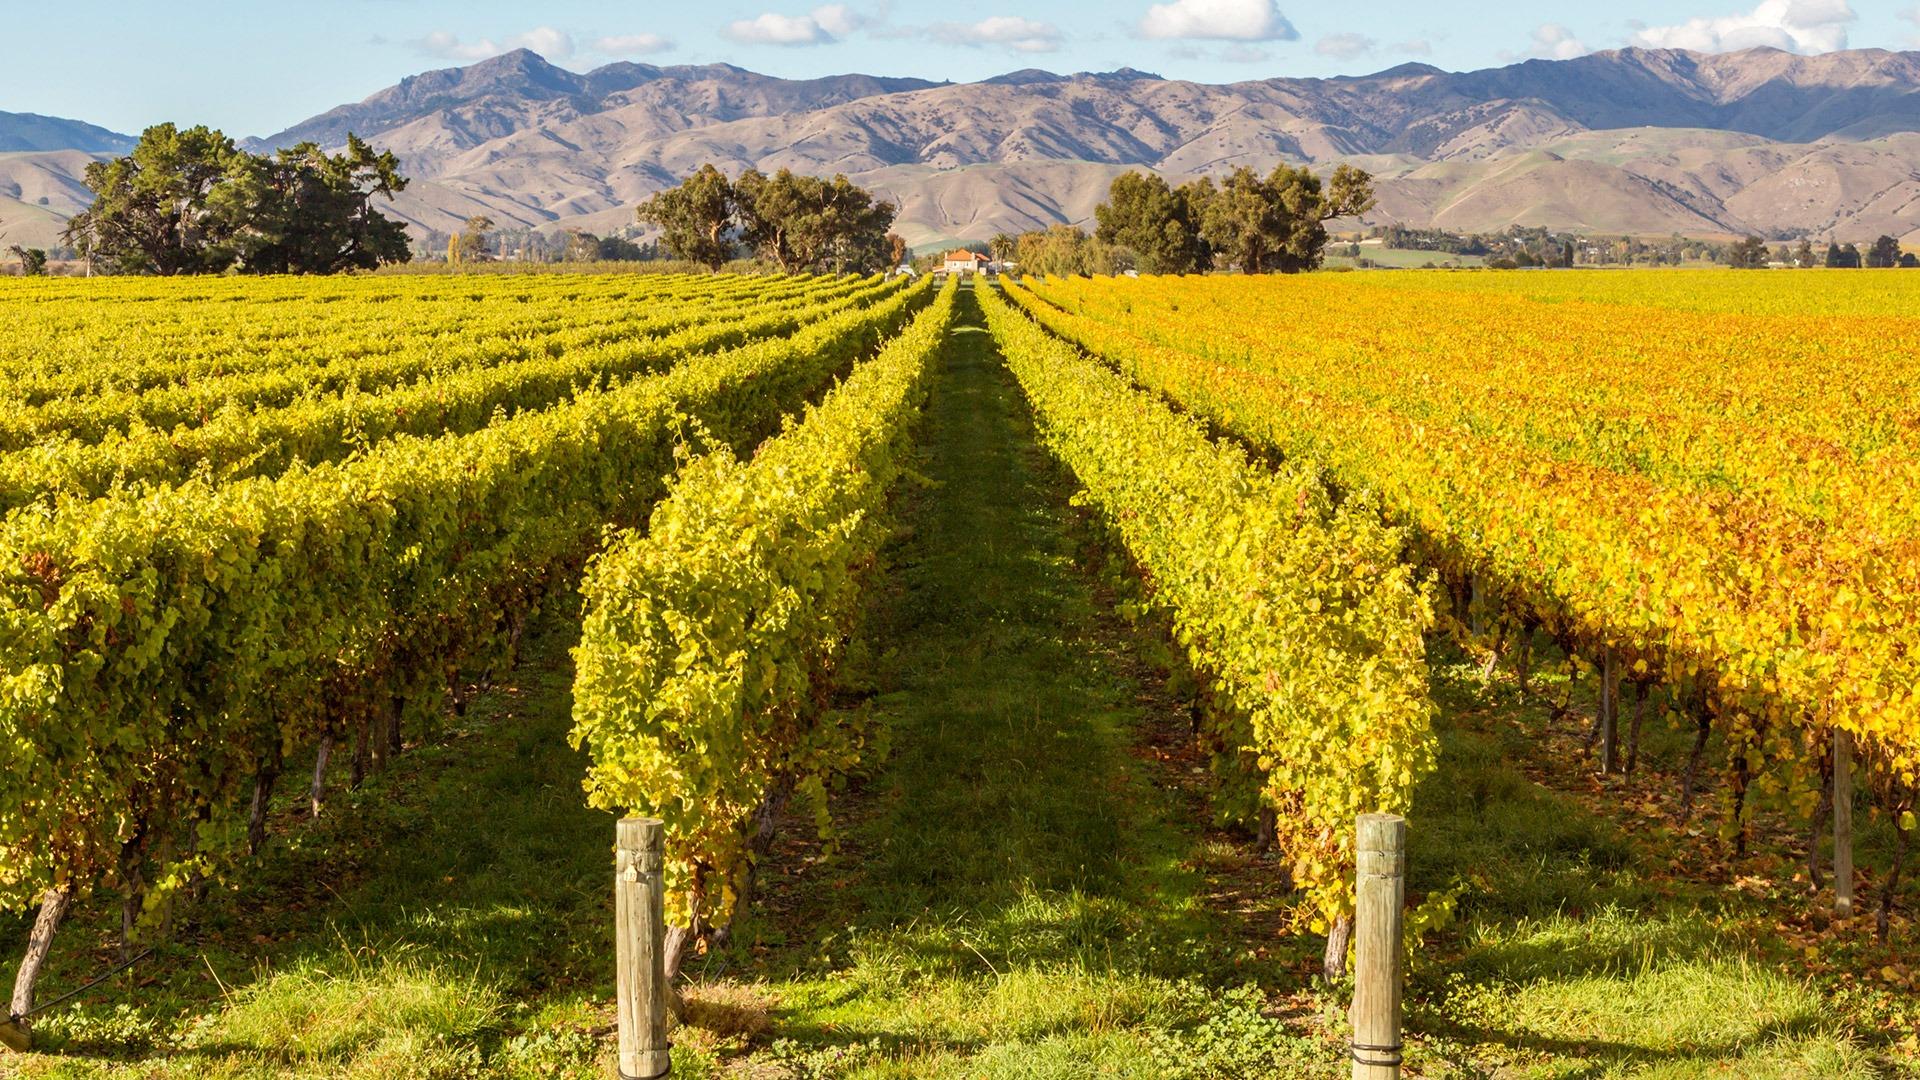 Vineyards in Blenheim, South Island, New Zealand